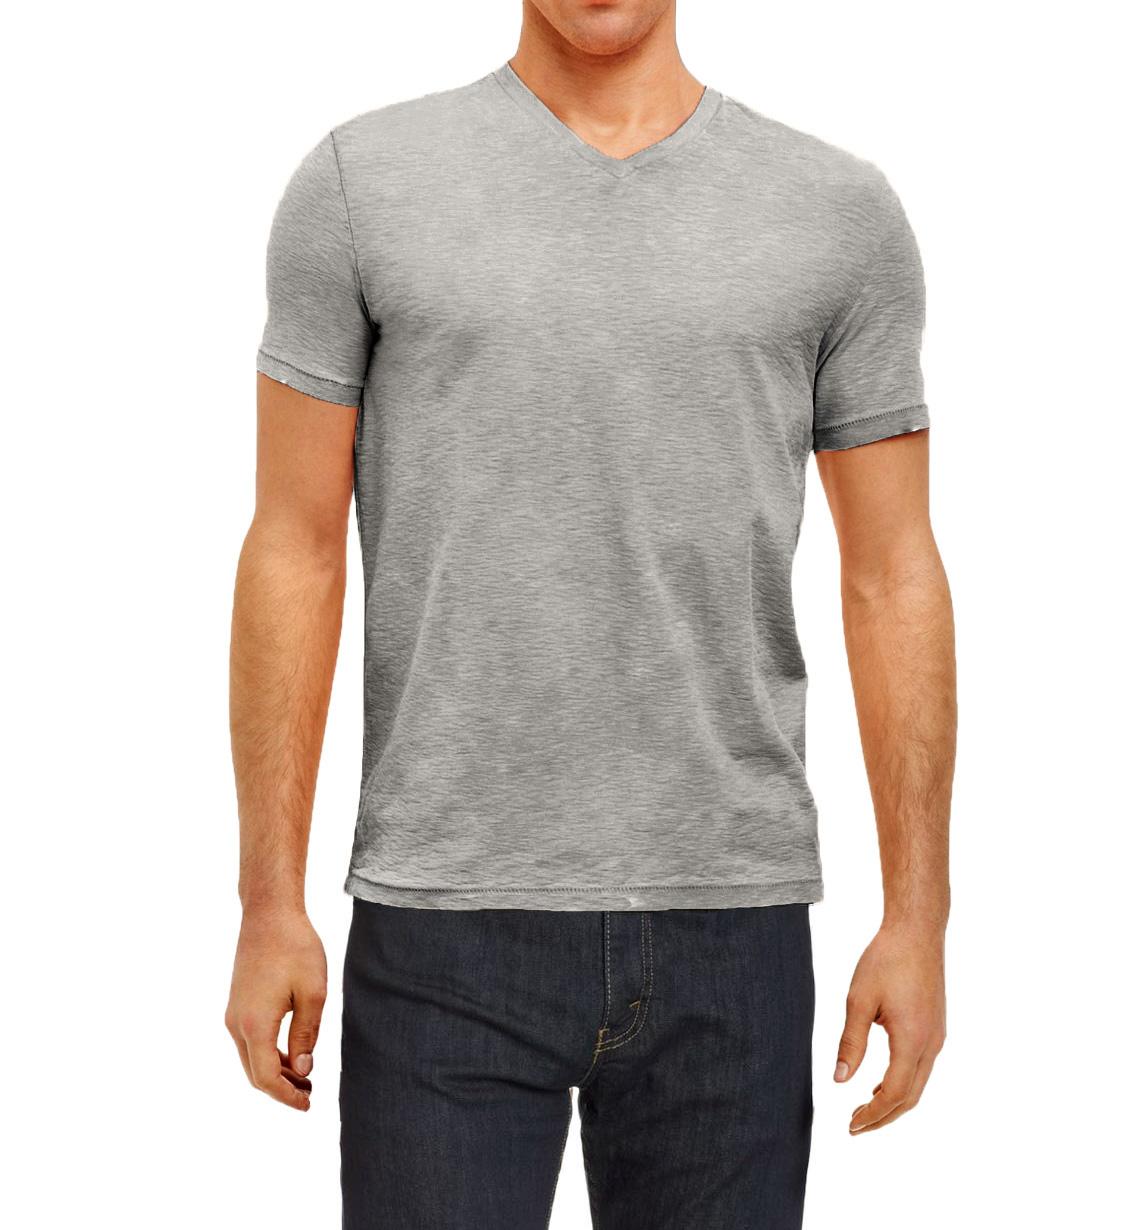 Kenneth cole reaction men 39 s slub knit v neck t shirt ebay for What is a slub shirt